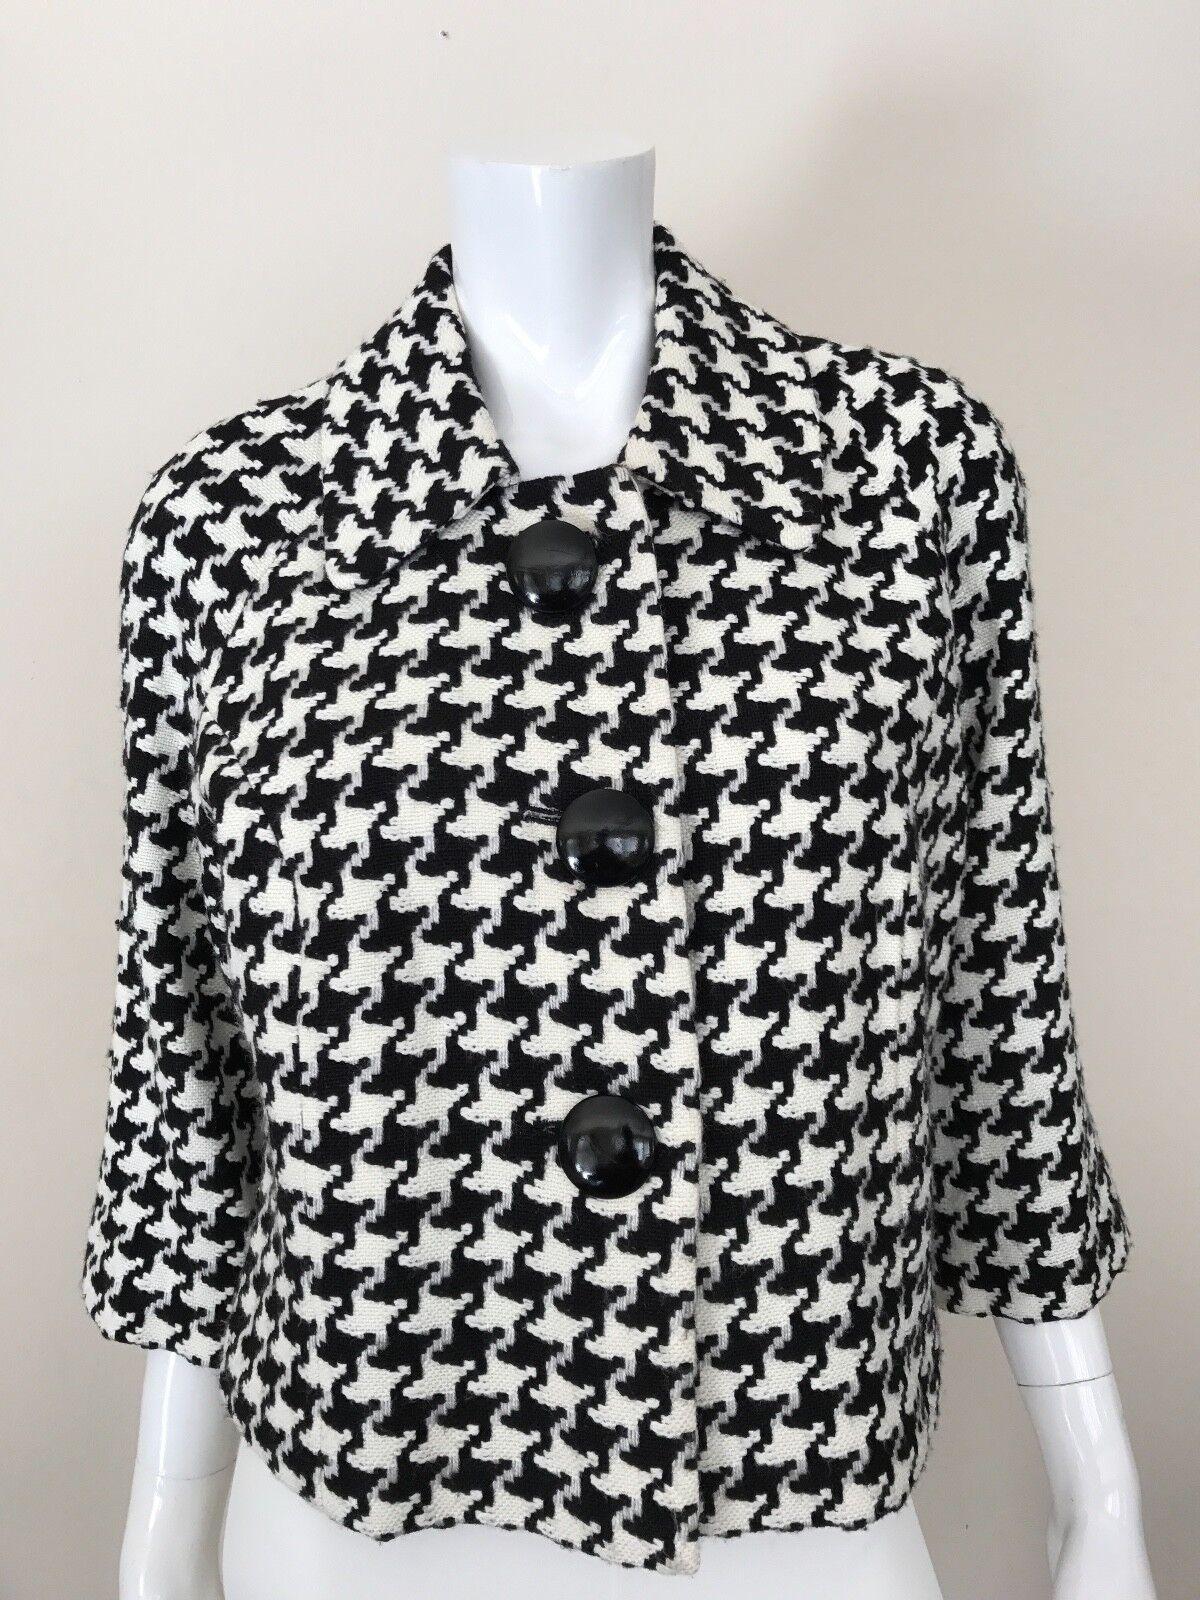 MAAKIF JACKET Black and White Houndstooth Pattern Knit Bolero Coat ...